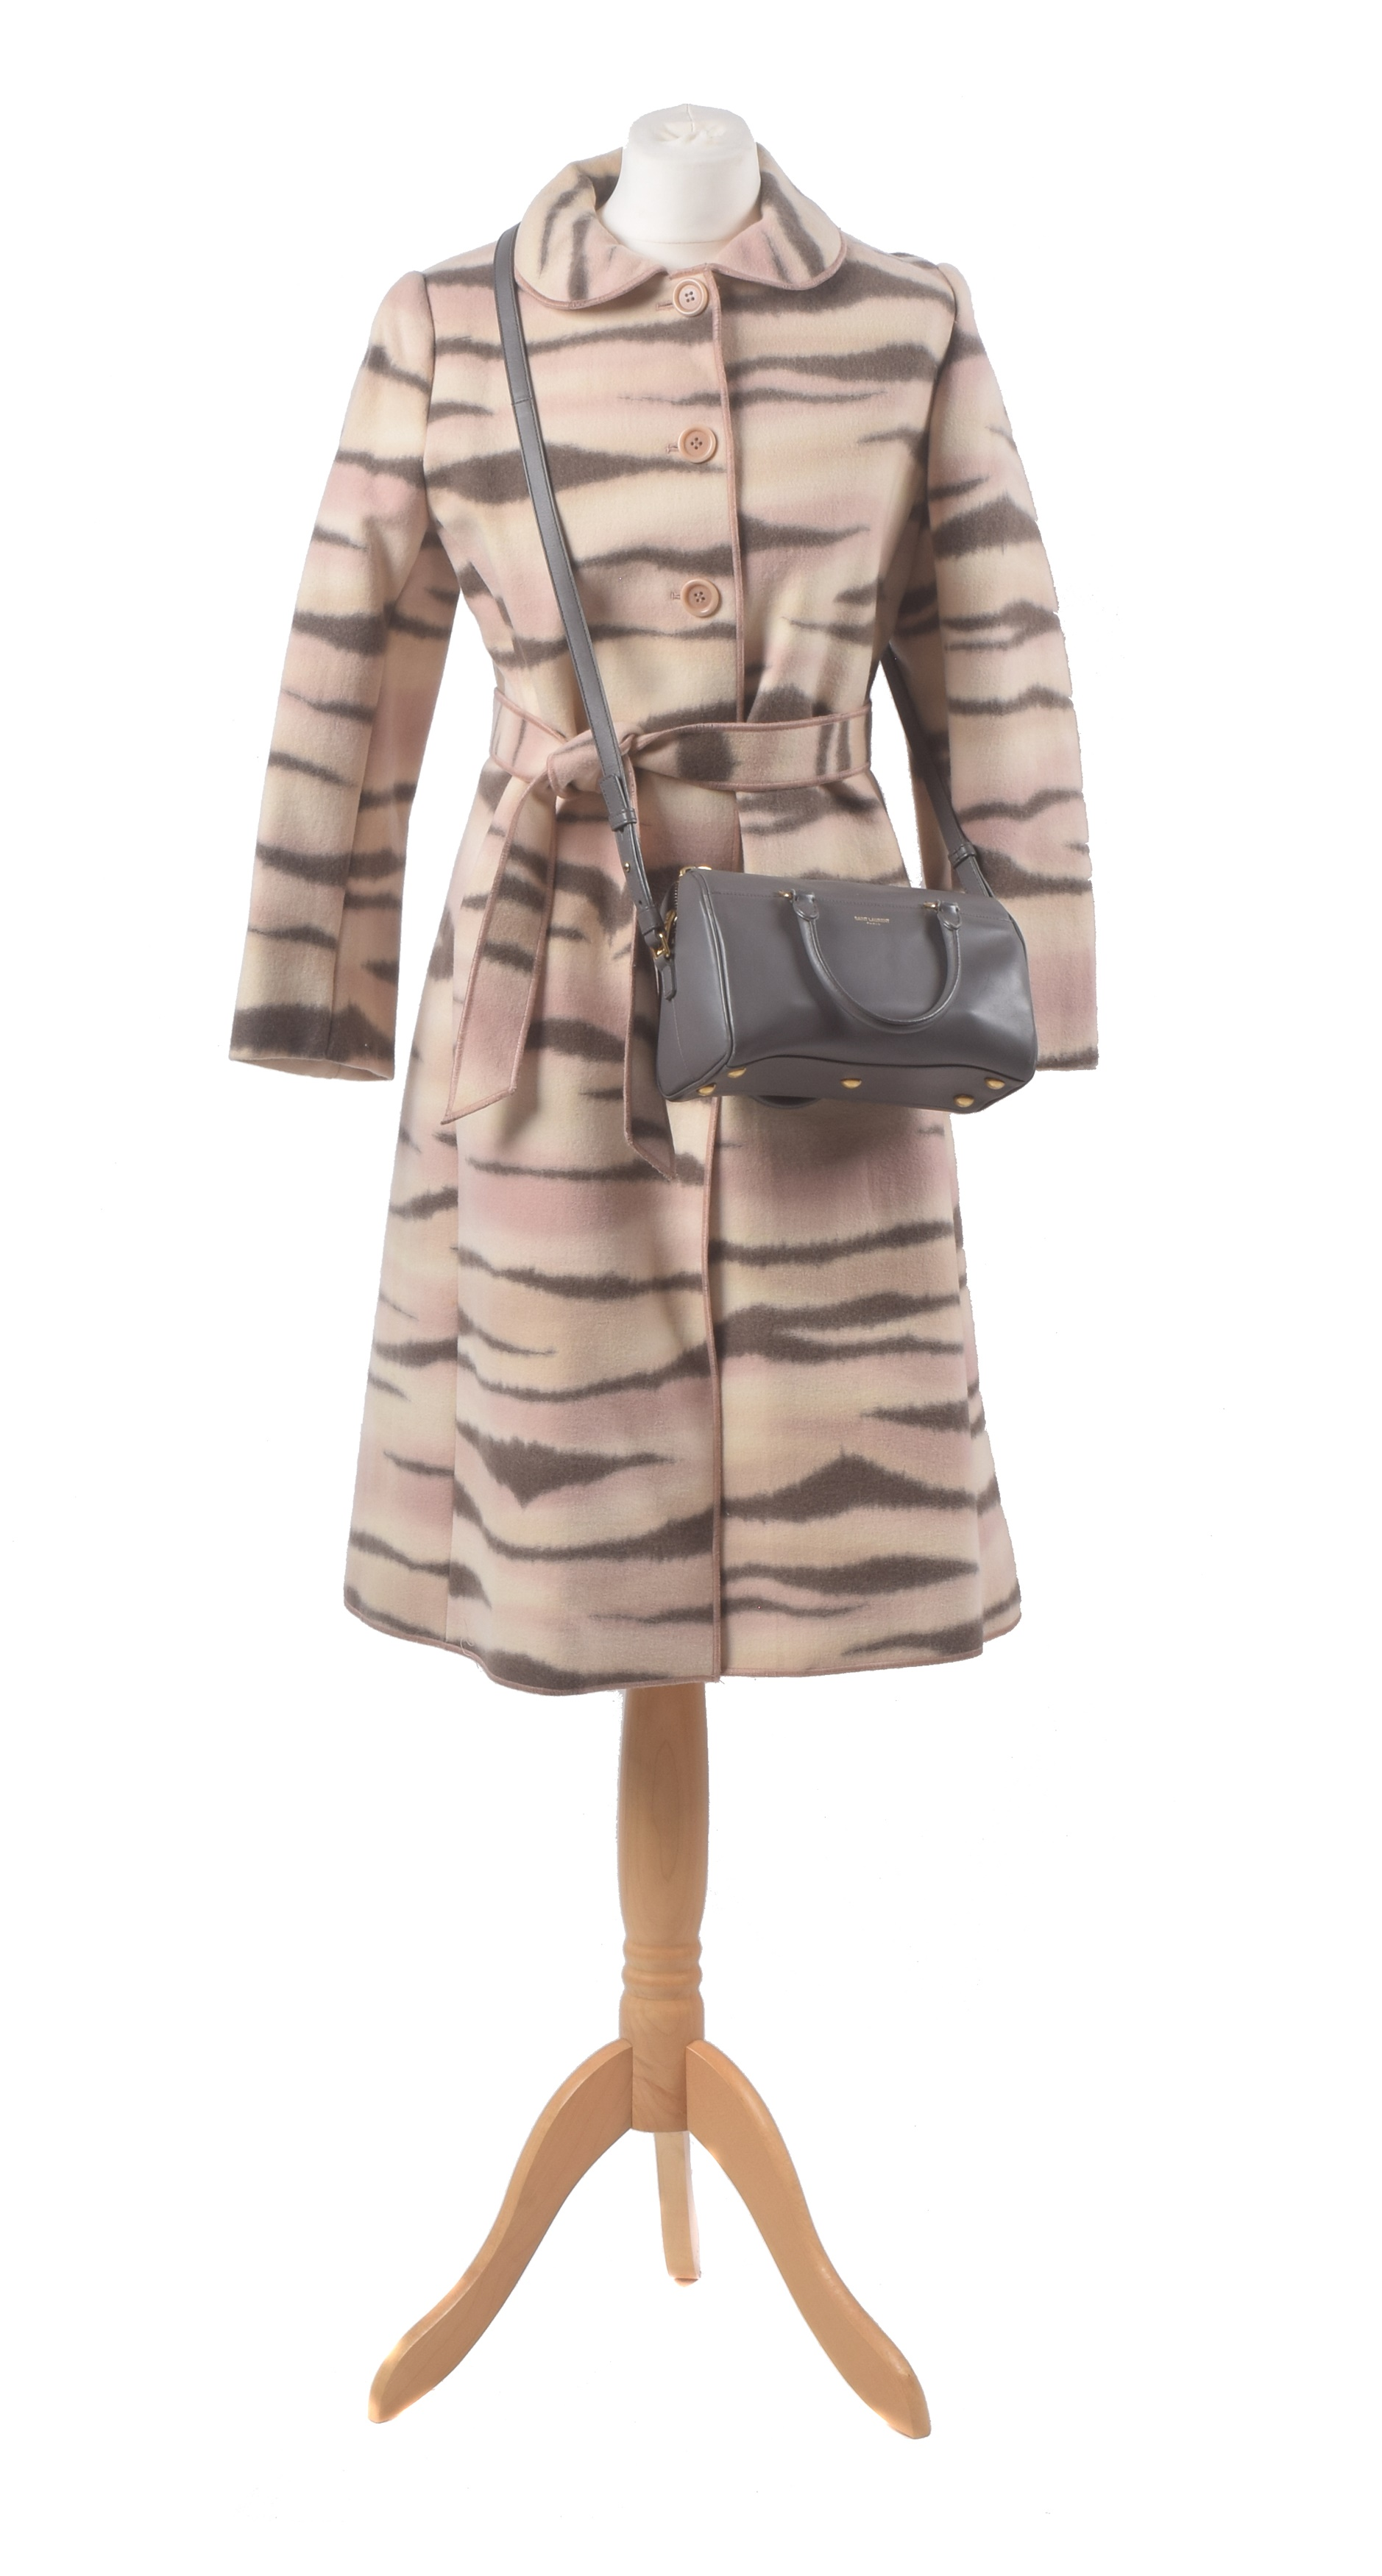 Moschino coat, YSL bag